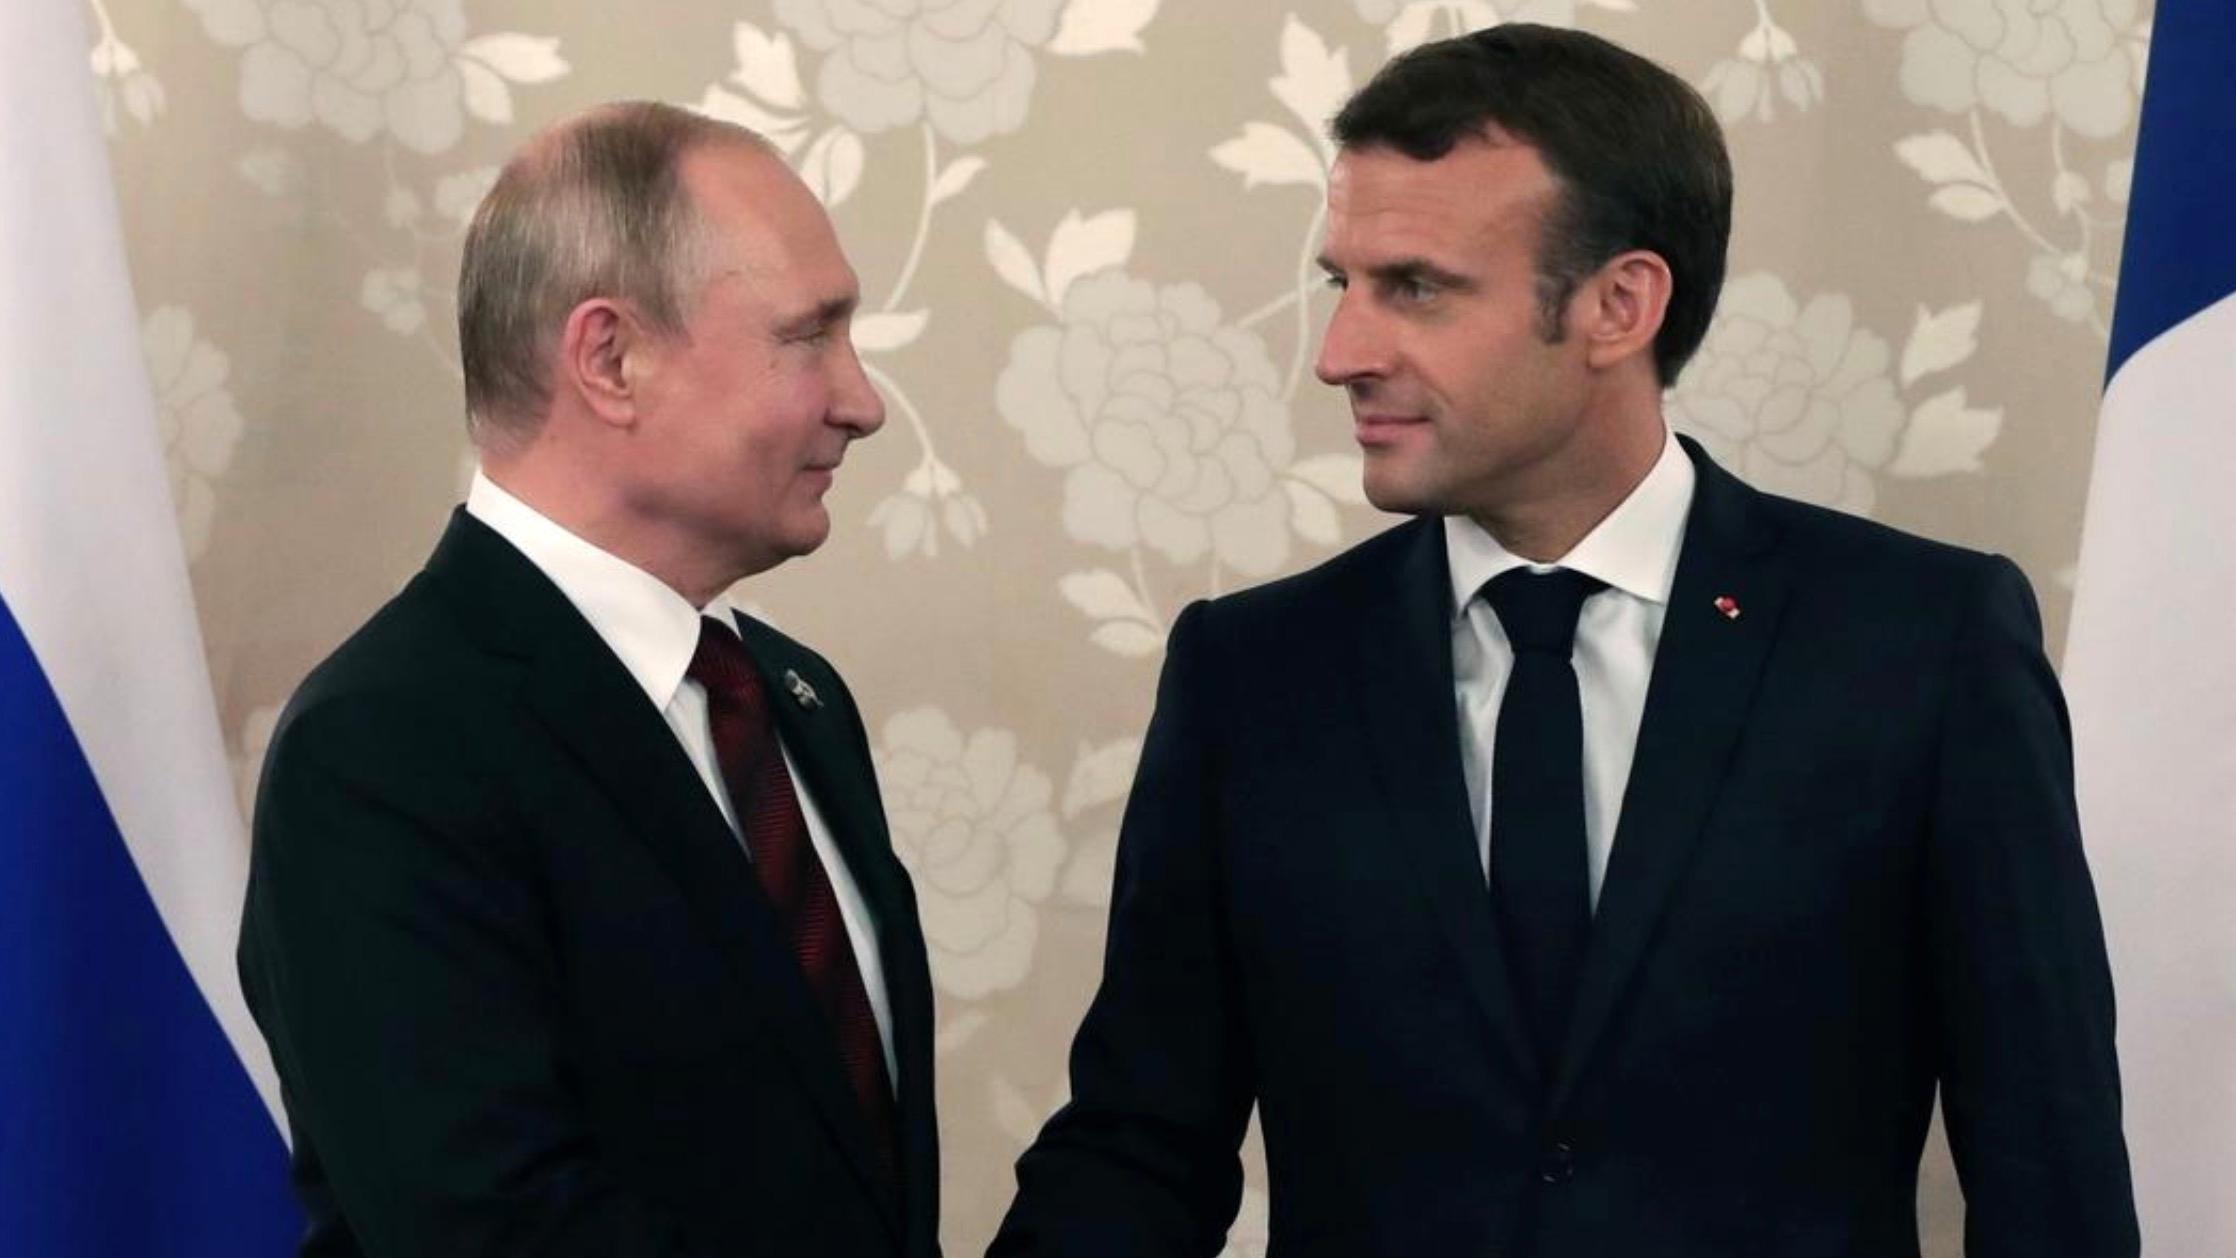 Putin Macron Discuss Situation In Lebanon Ukraine By Phone Cgtn